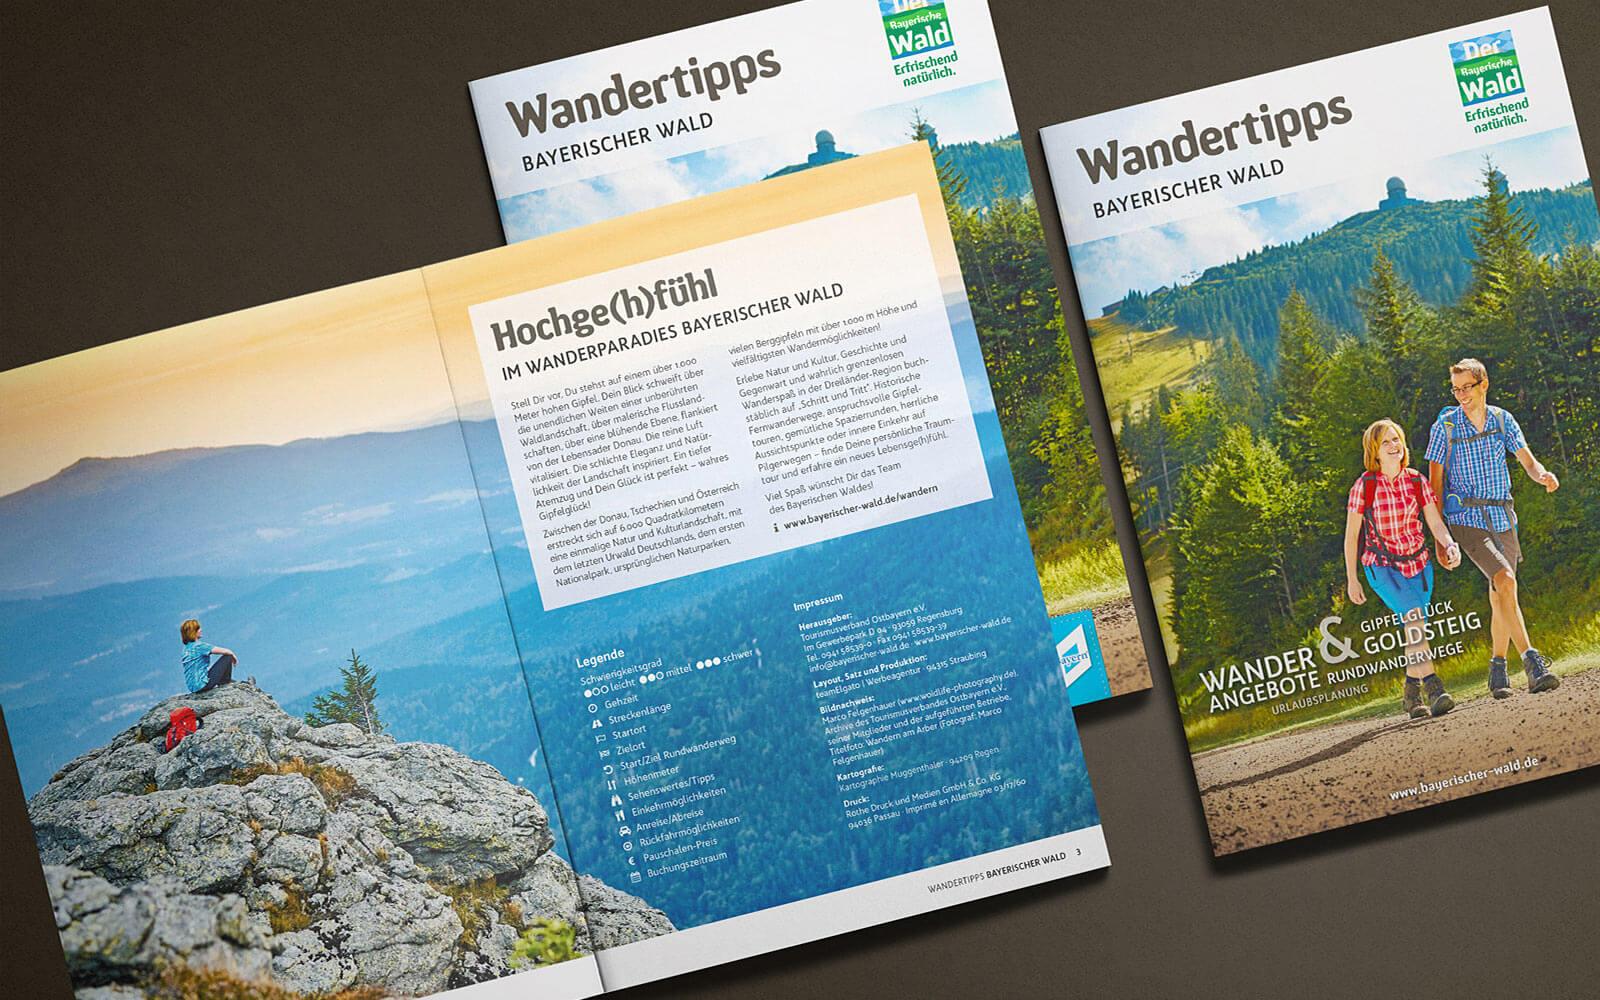 Bayerischer Wald – PocketGuide Wandertipps